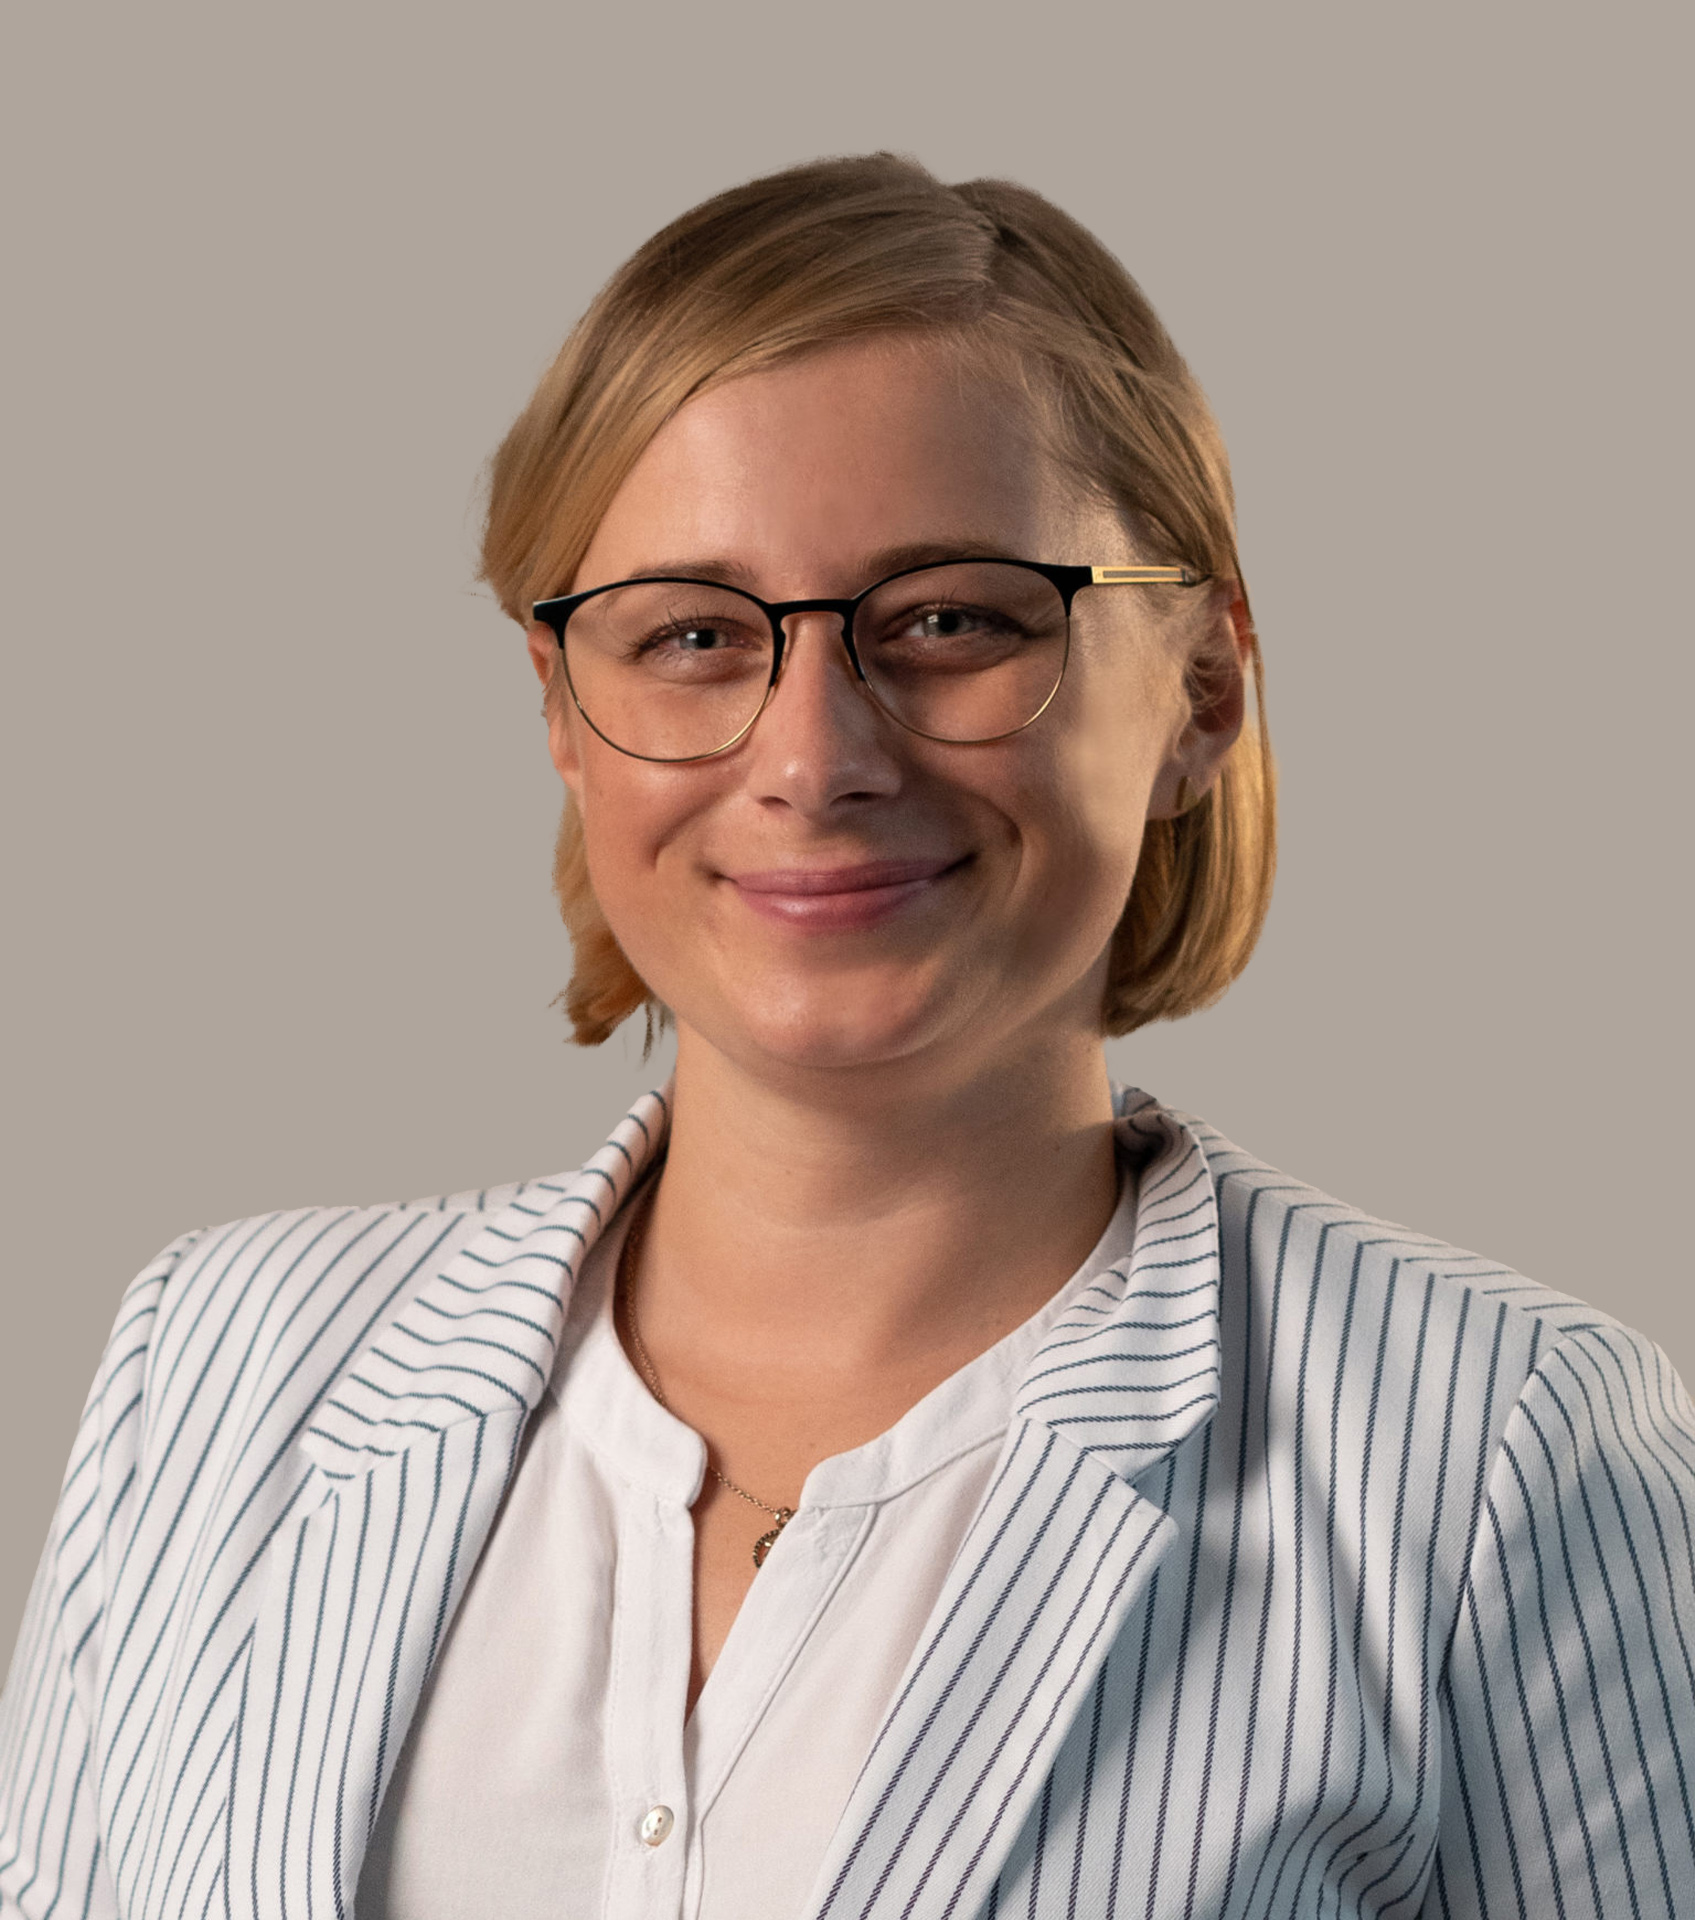 Ilona Laskowska-Stępień